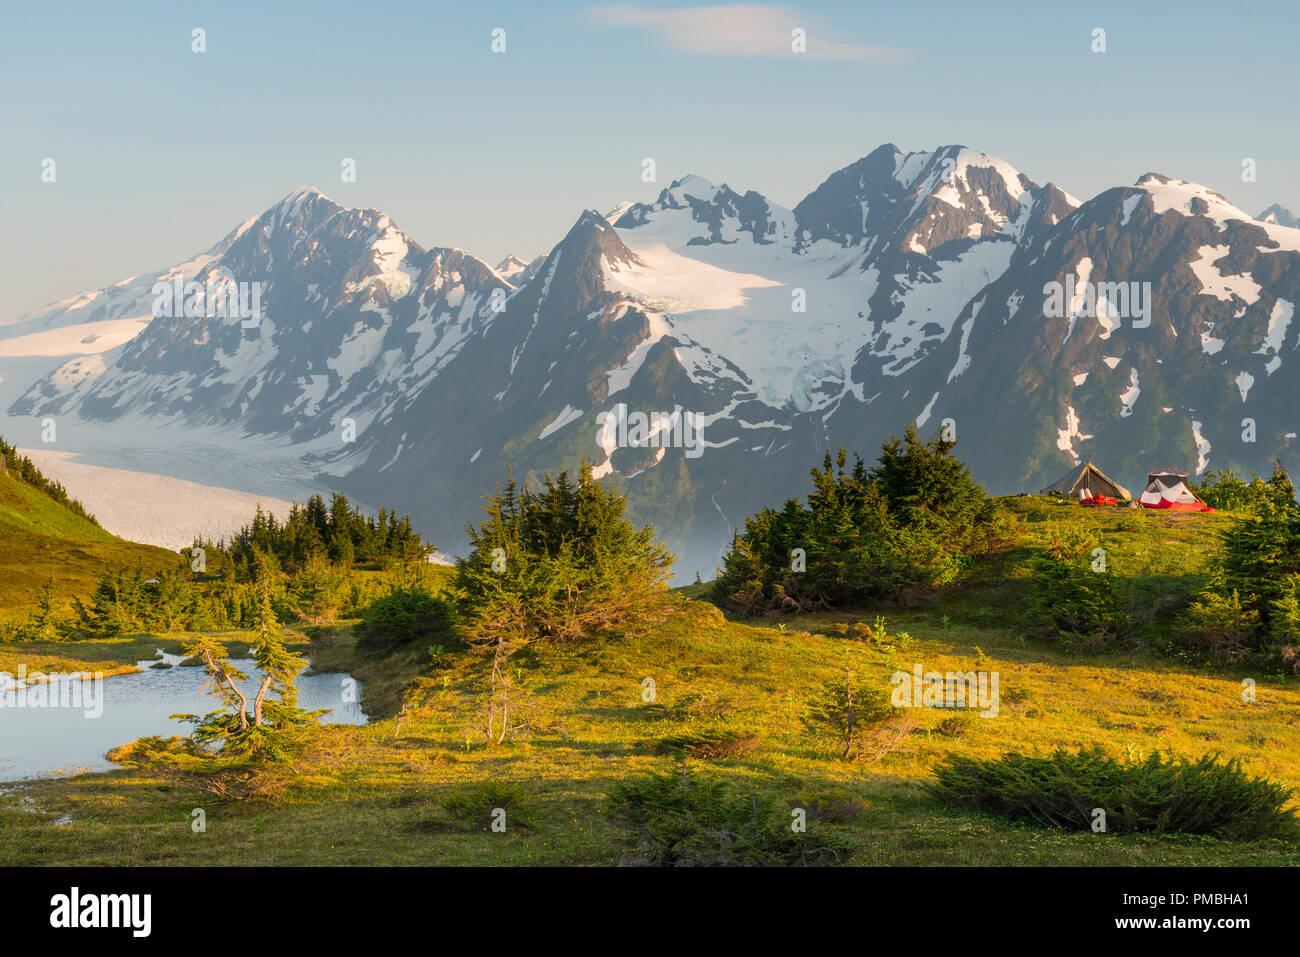 Backpacking to the Spencer Glacier Bench, Chugach National Forest, Alaska. - Stock Image